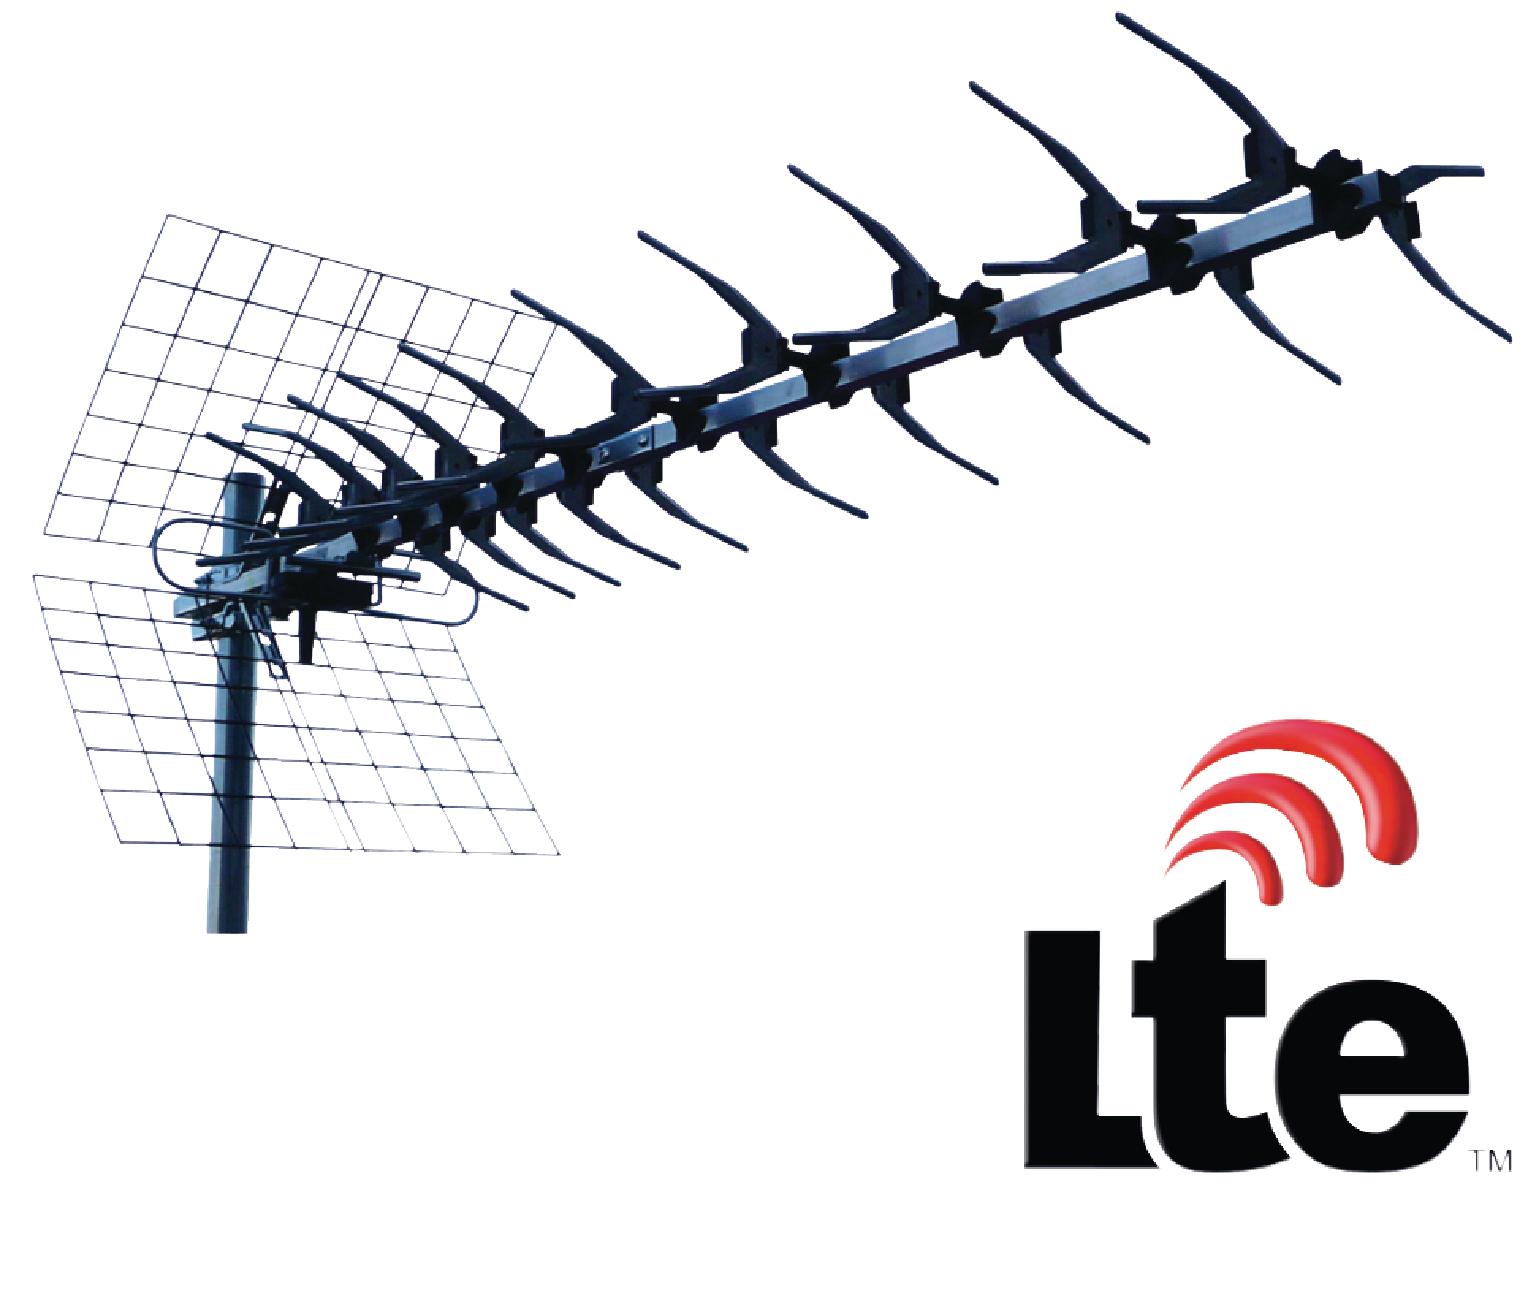 Anténa UHF DVB-T/T2 LTE 13 dB König ANT-UHF60L-KN